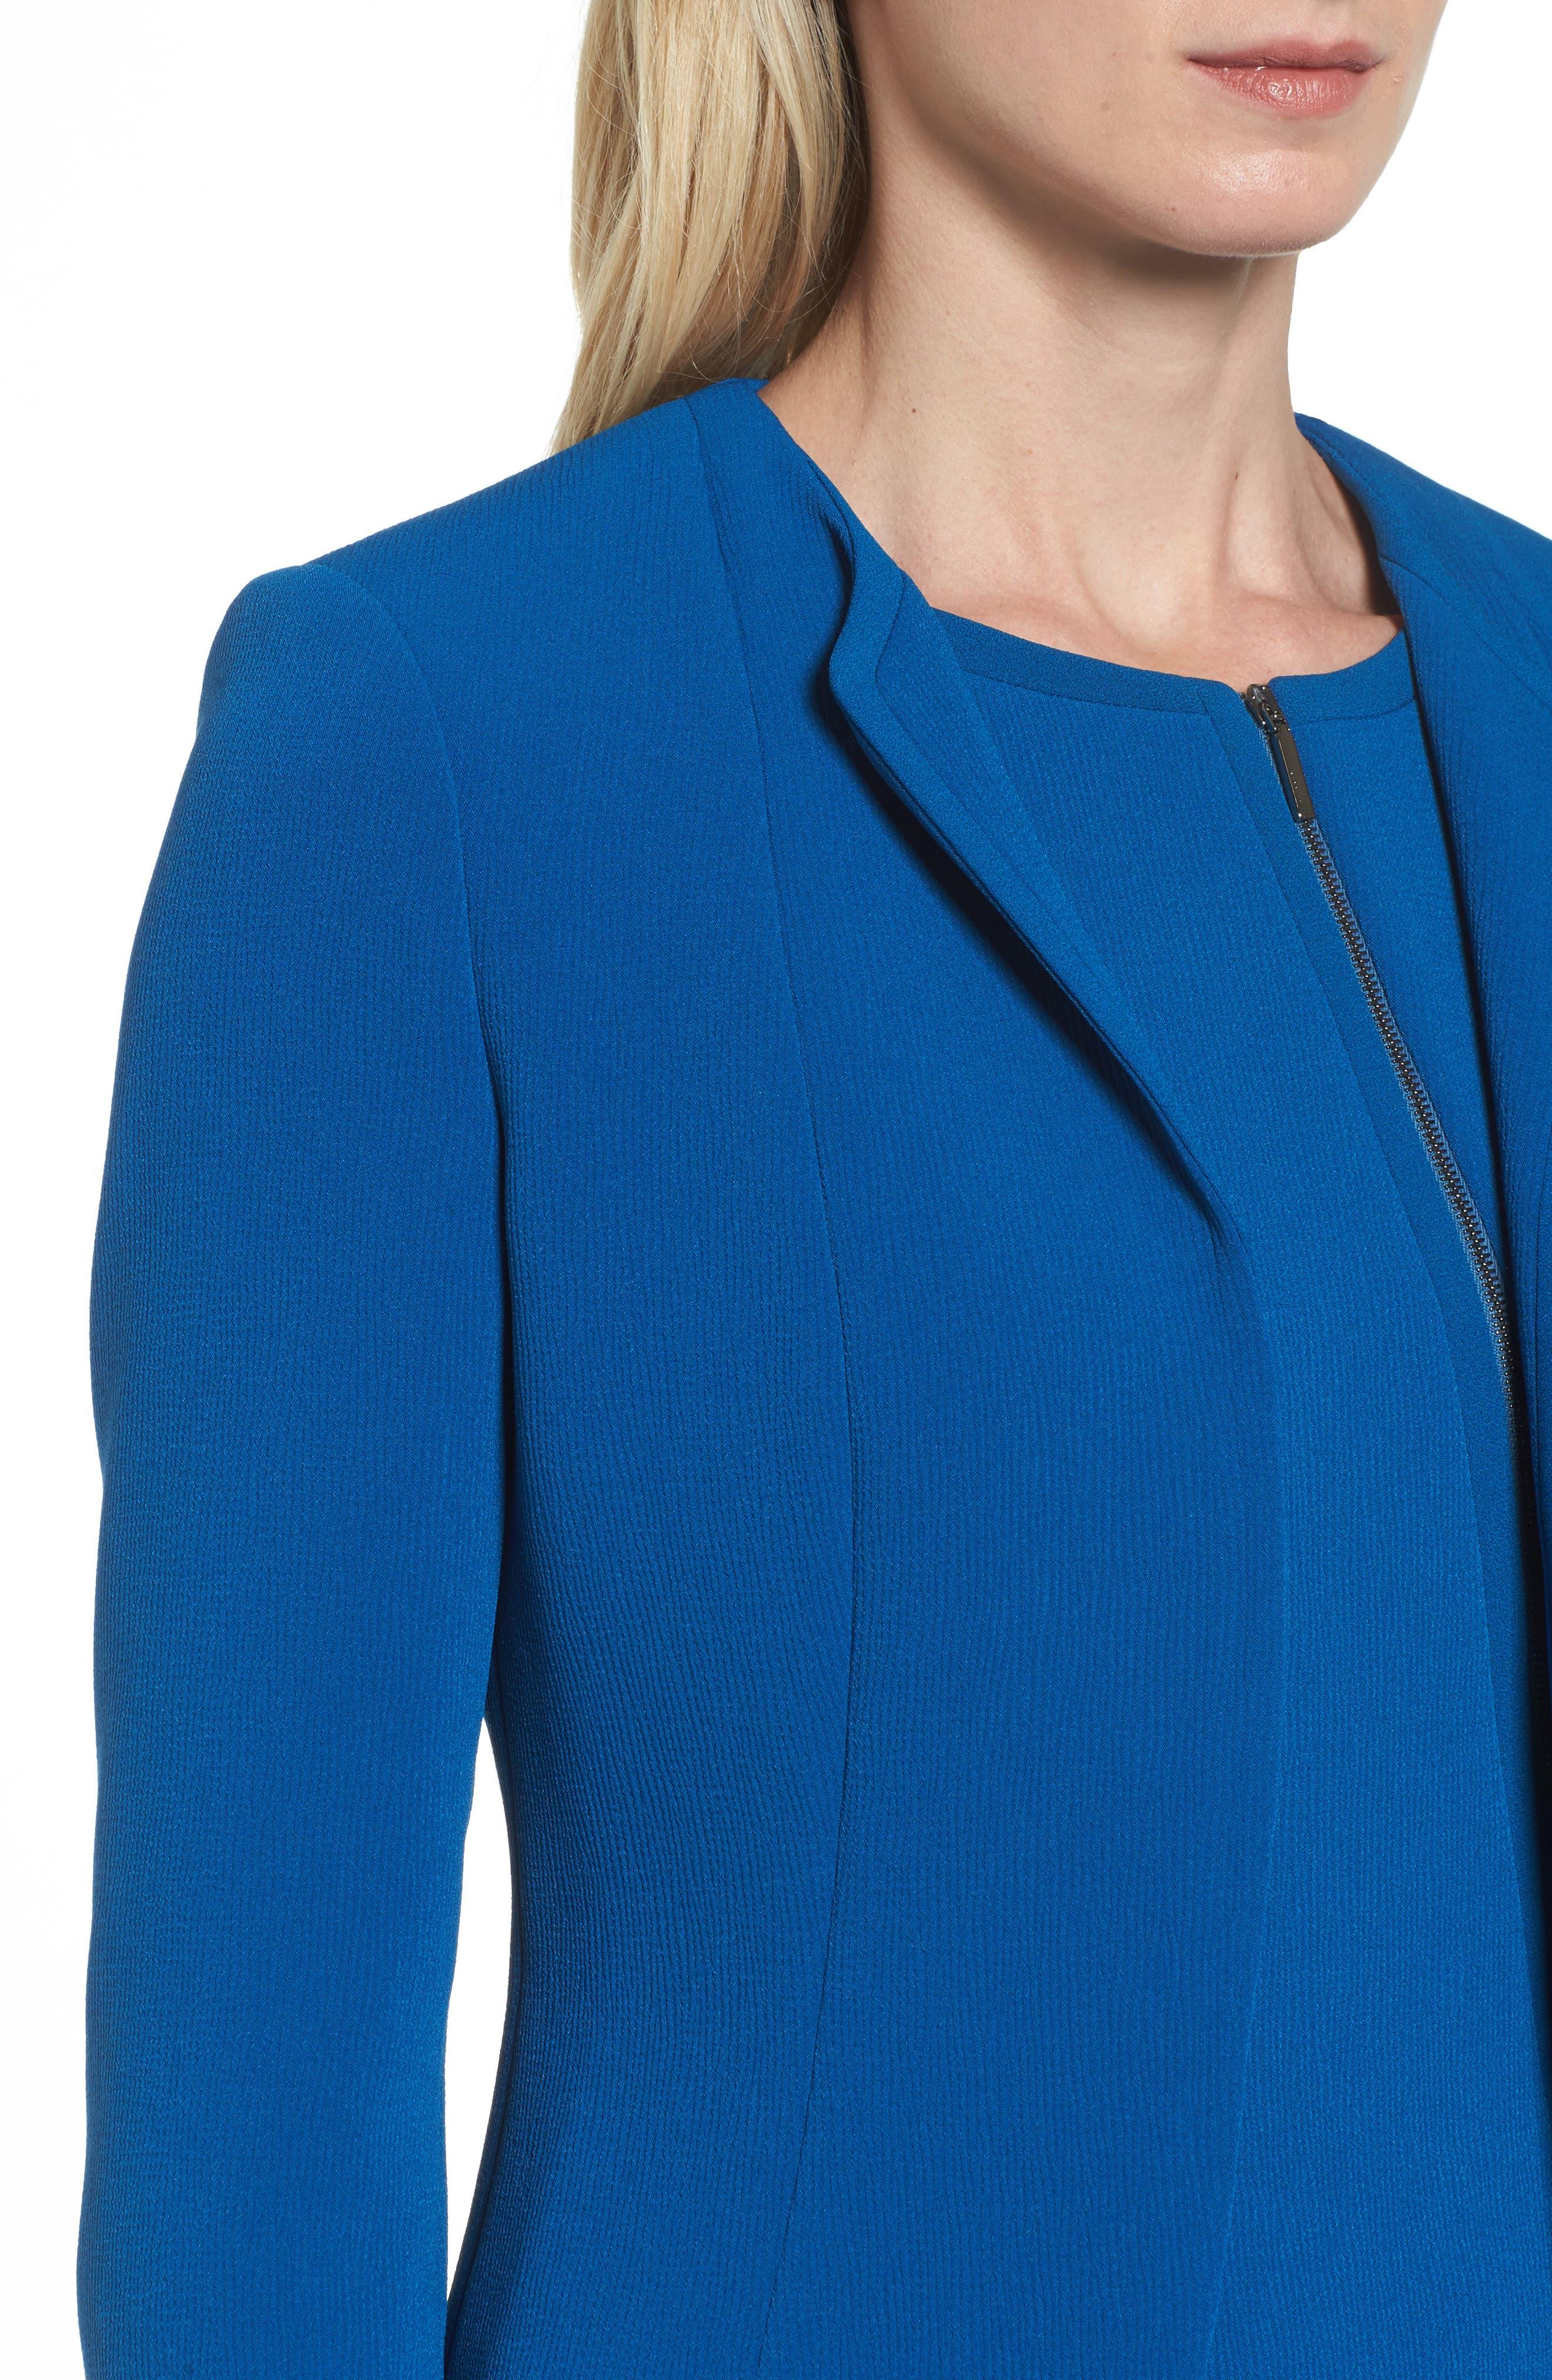 Alternate Image 4  - BOSS Jerusa Crop Suit Jacket (Petite) (Nordstrom Exclusive)